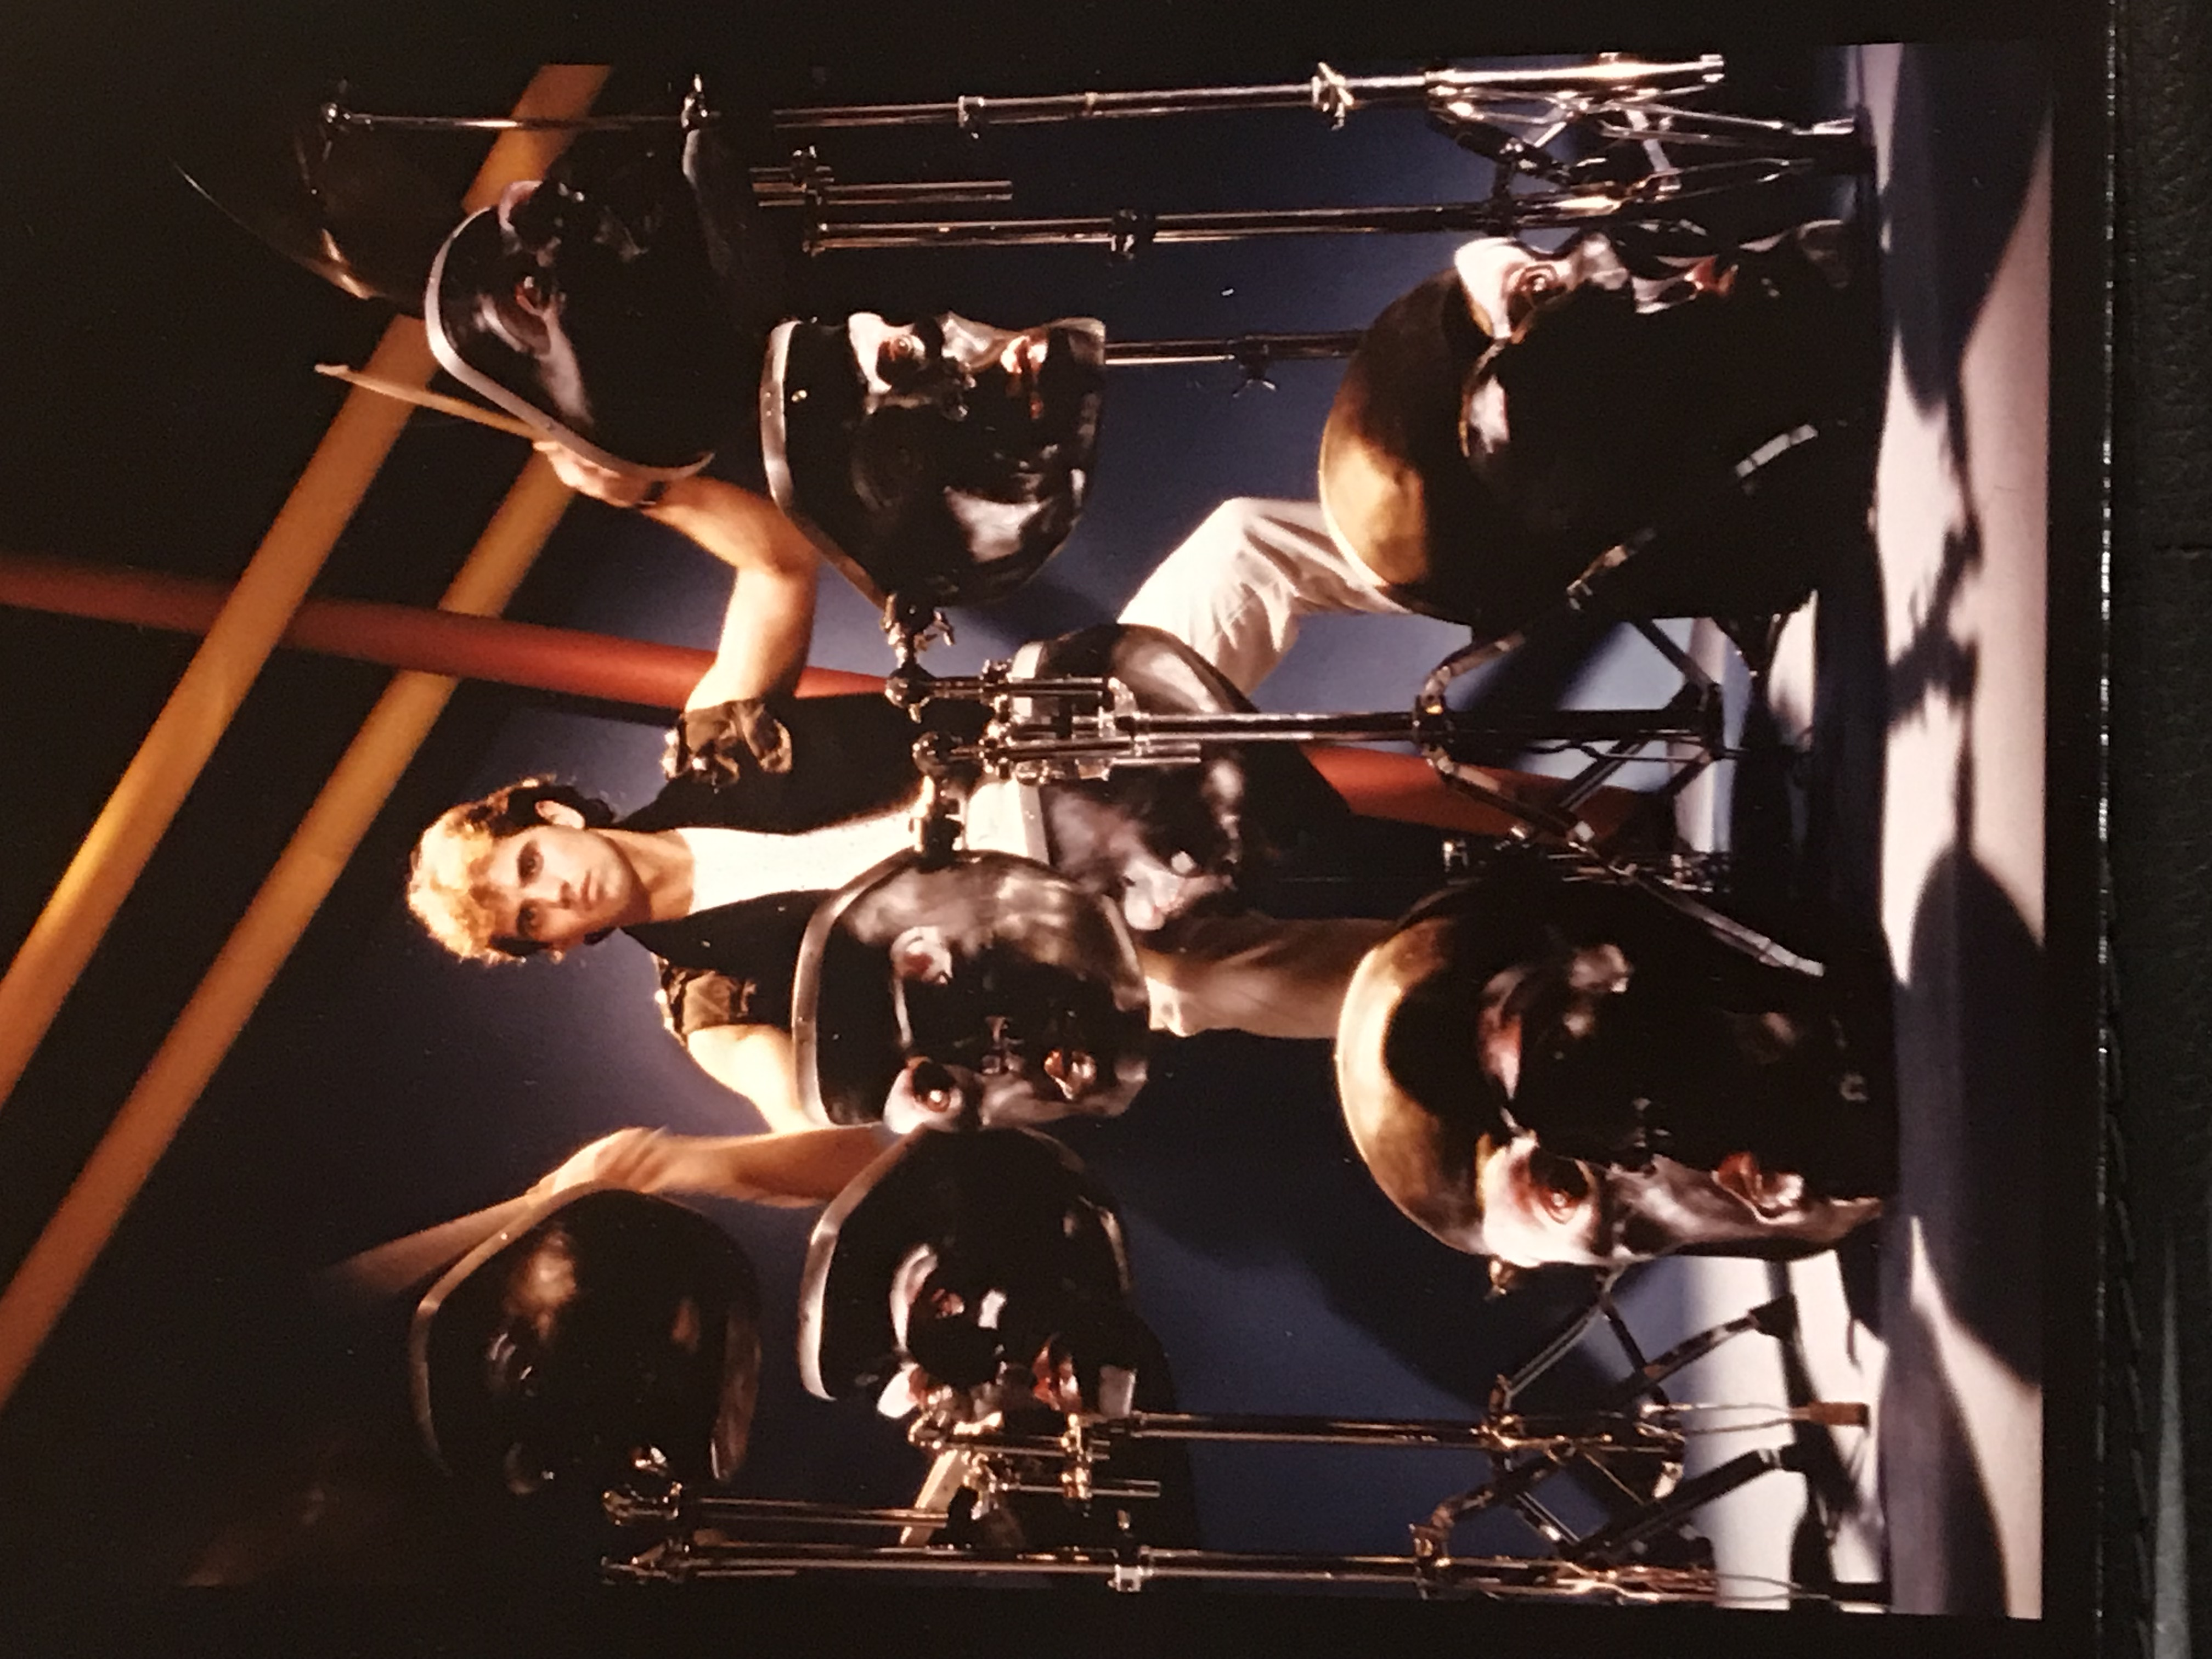 Richard James Burgess playing the creepy head kit. Photo courtesy Burgess.